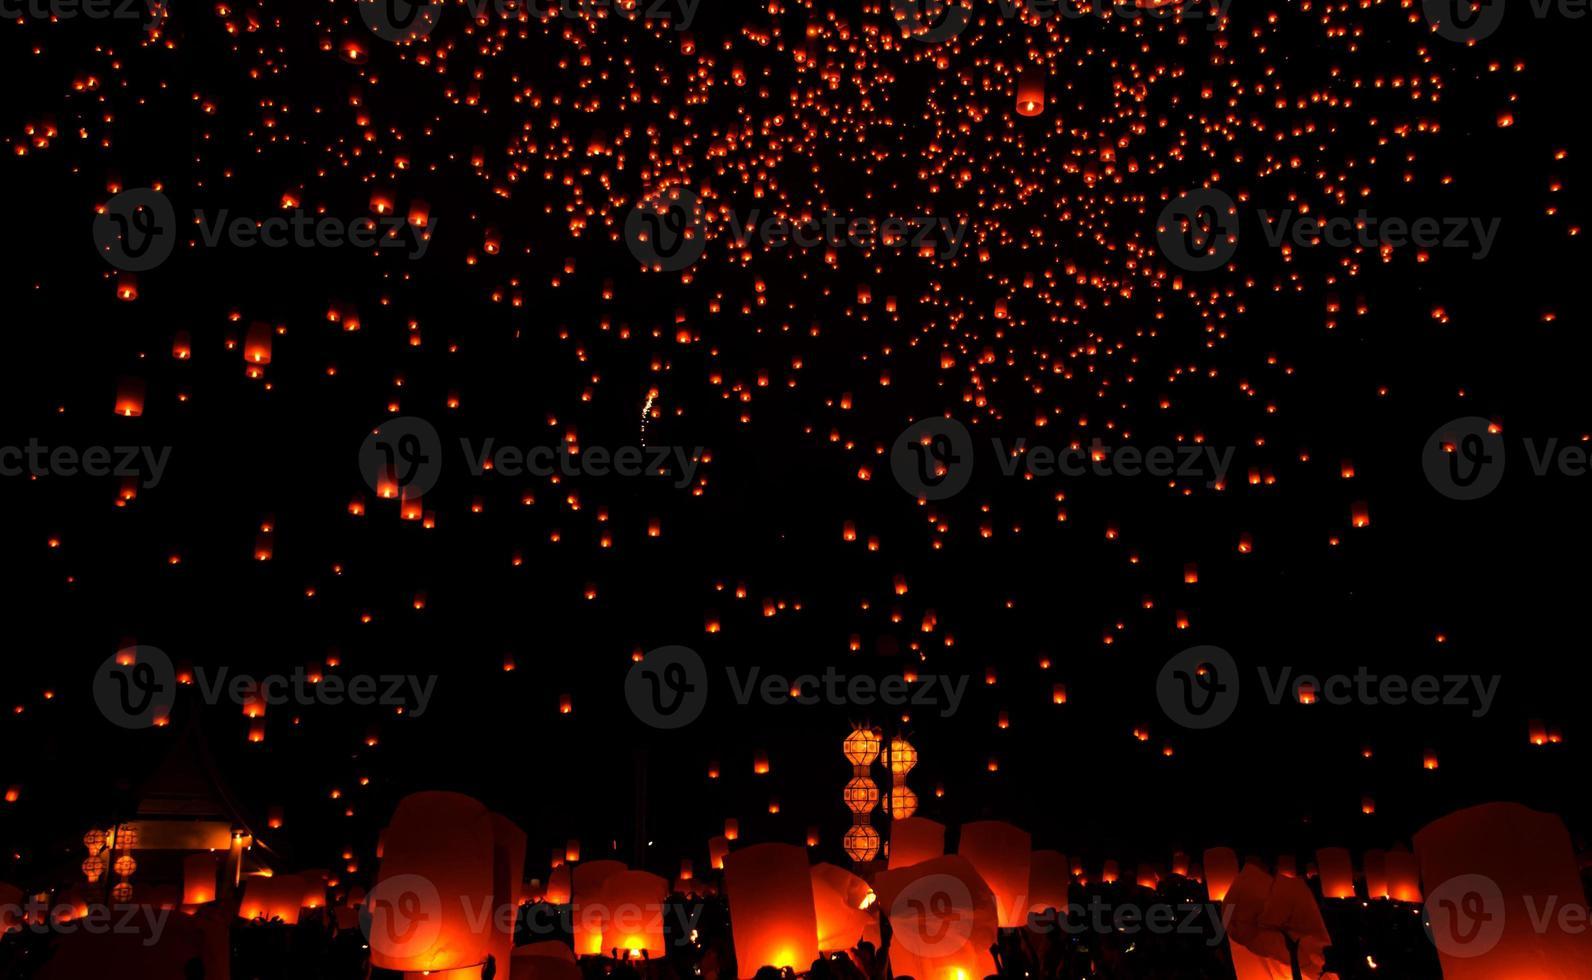 Yee peng, sky lantern photo